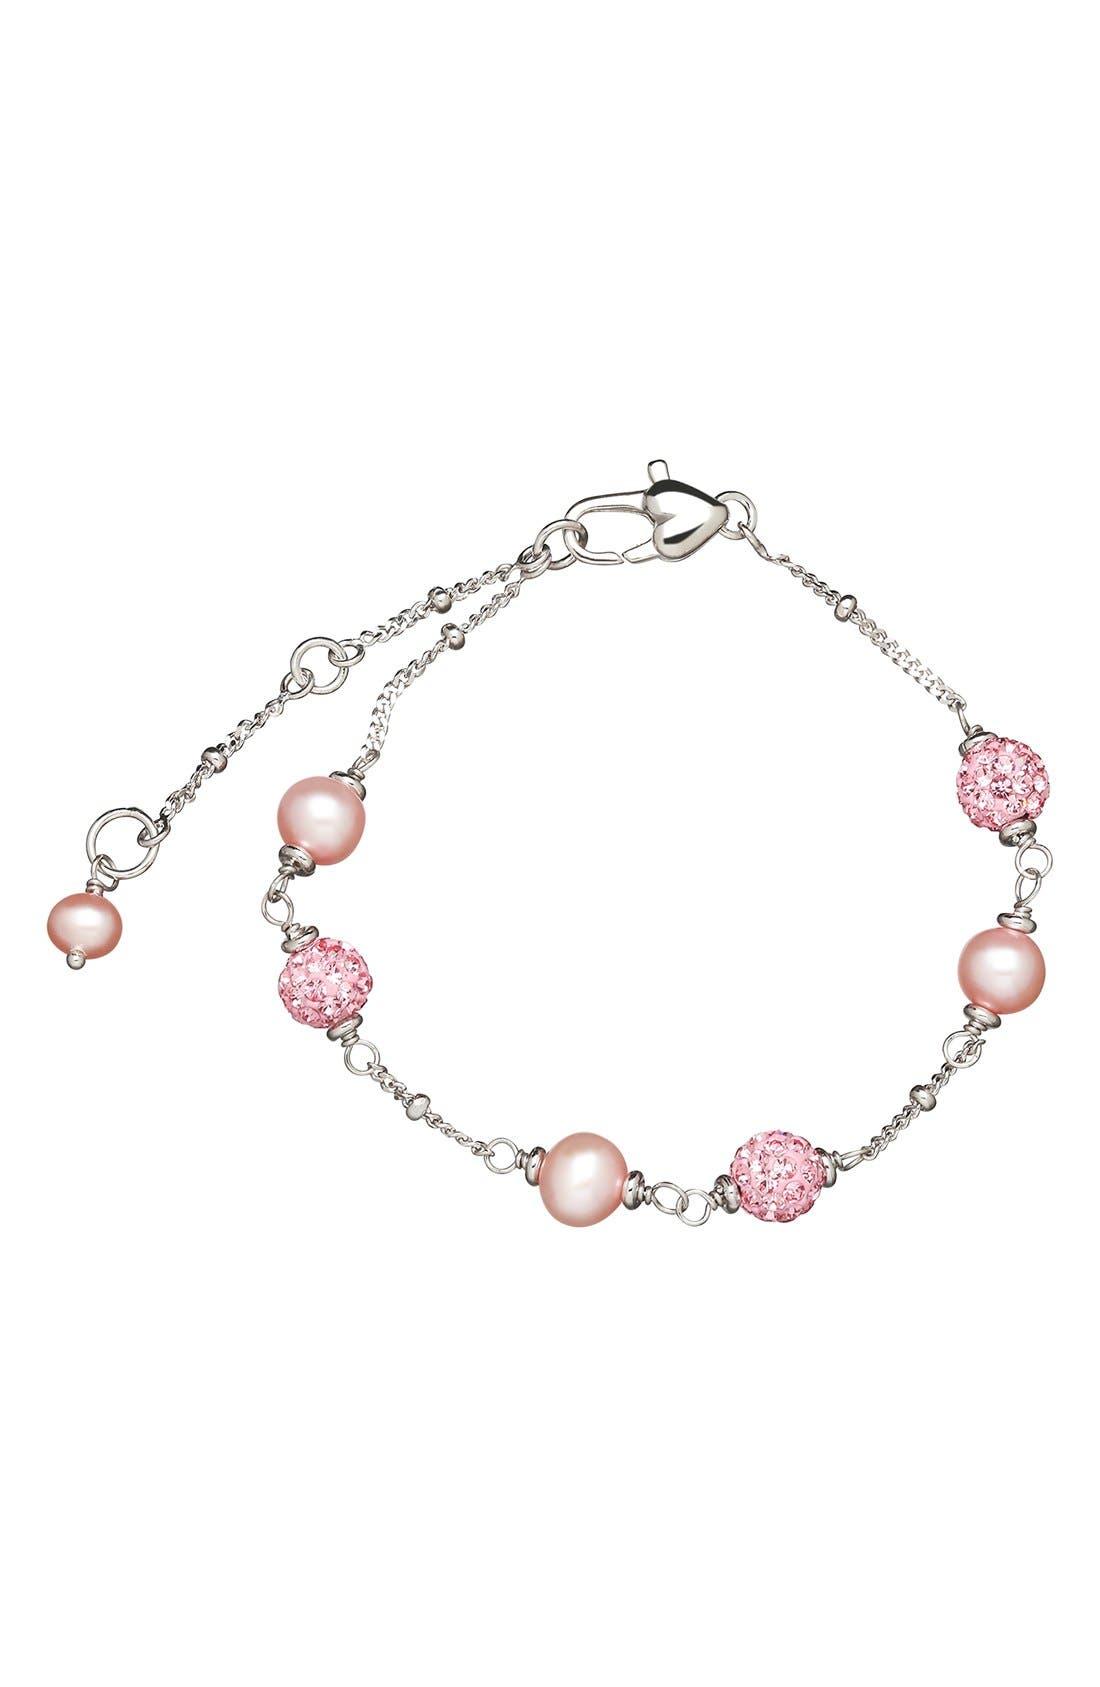 Crystal & Freshwater Pearl Station Bracelet,                             Alternate thumbnail 2, color,                             650